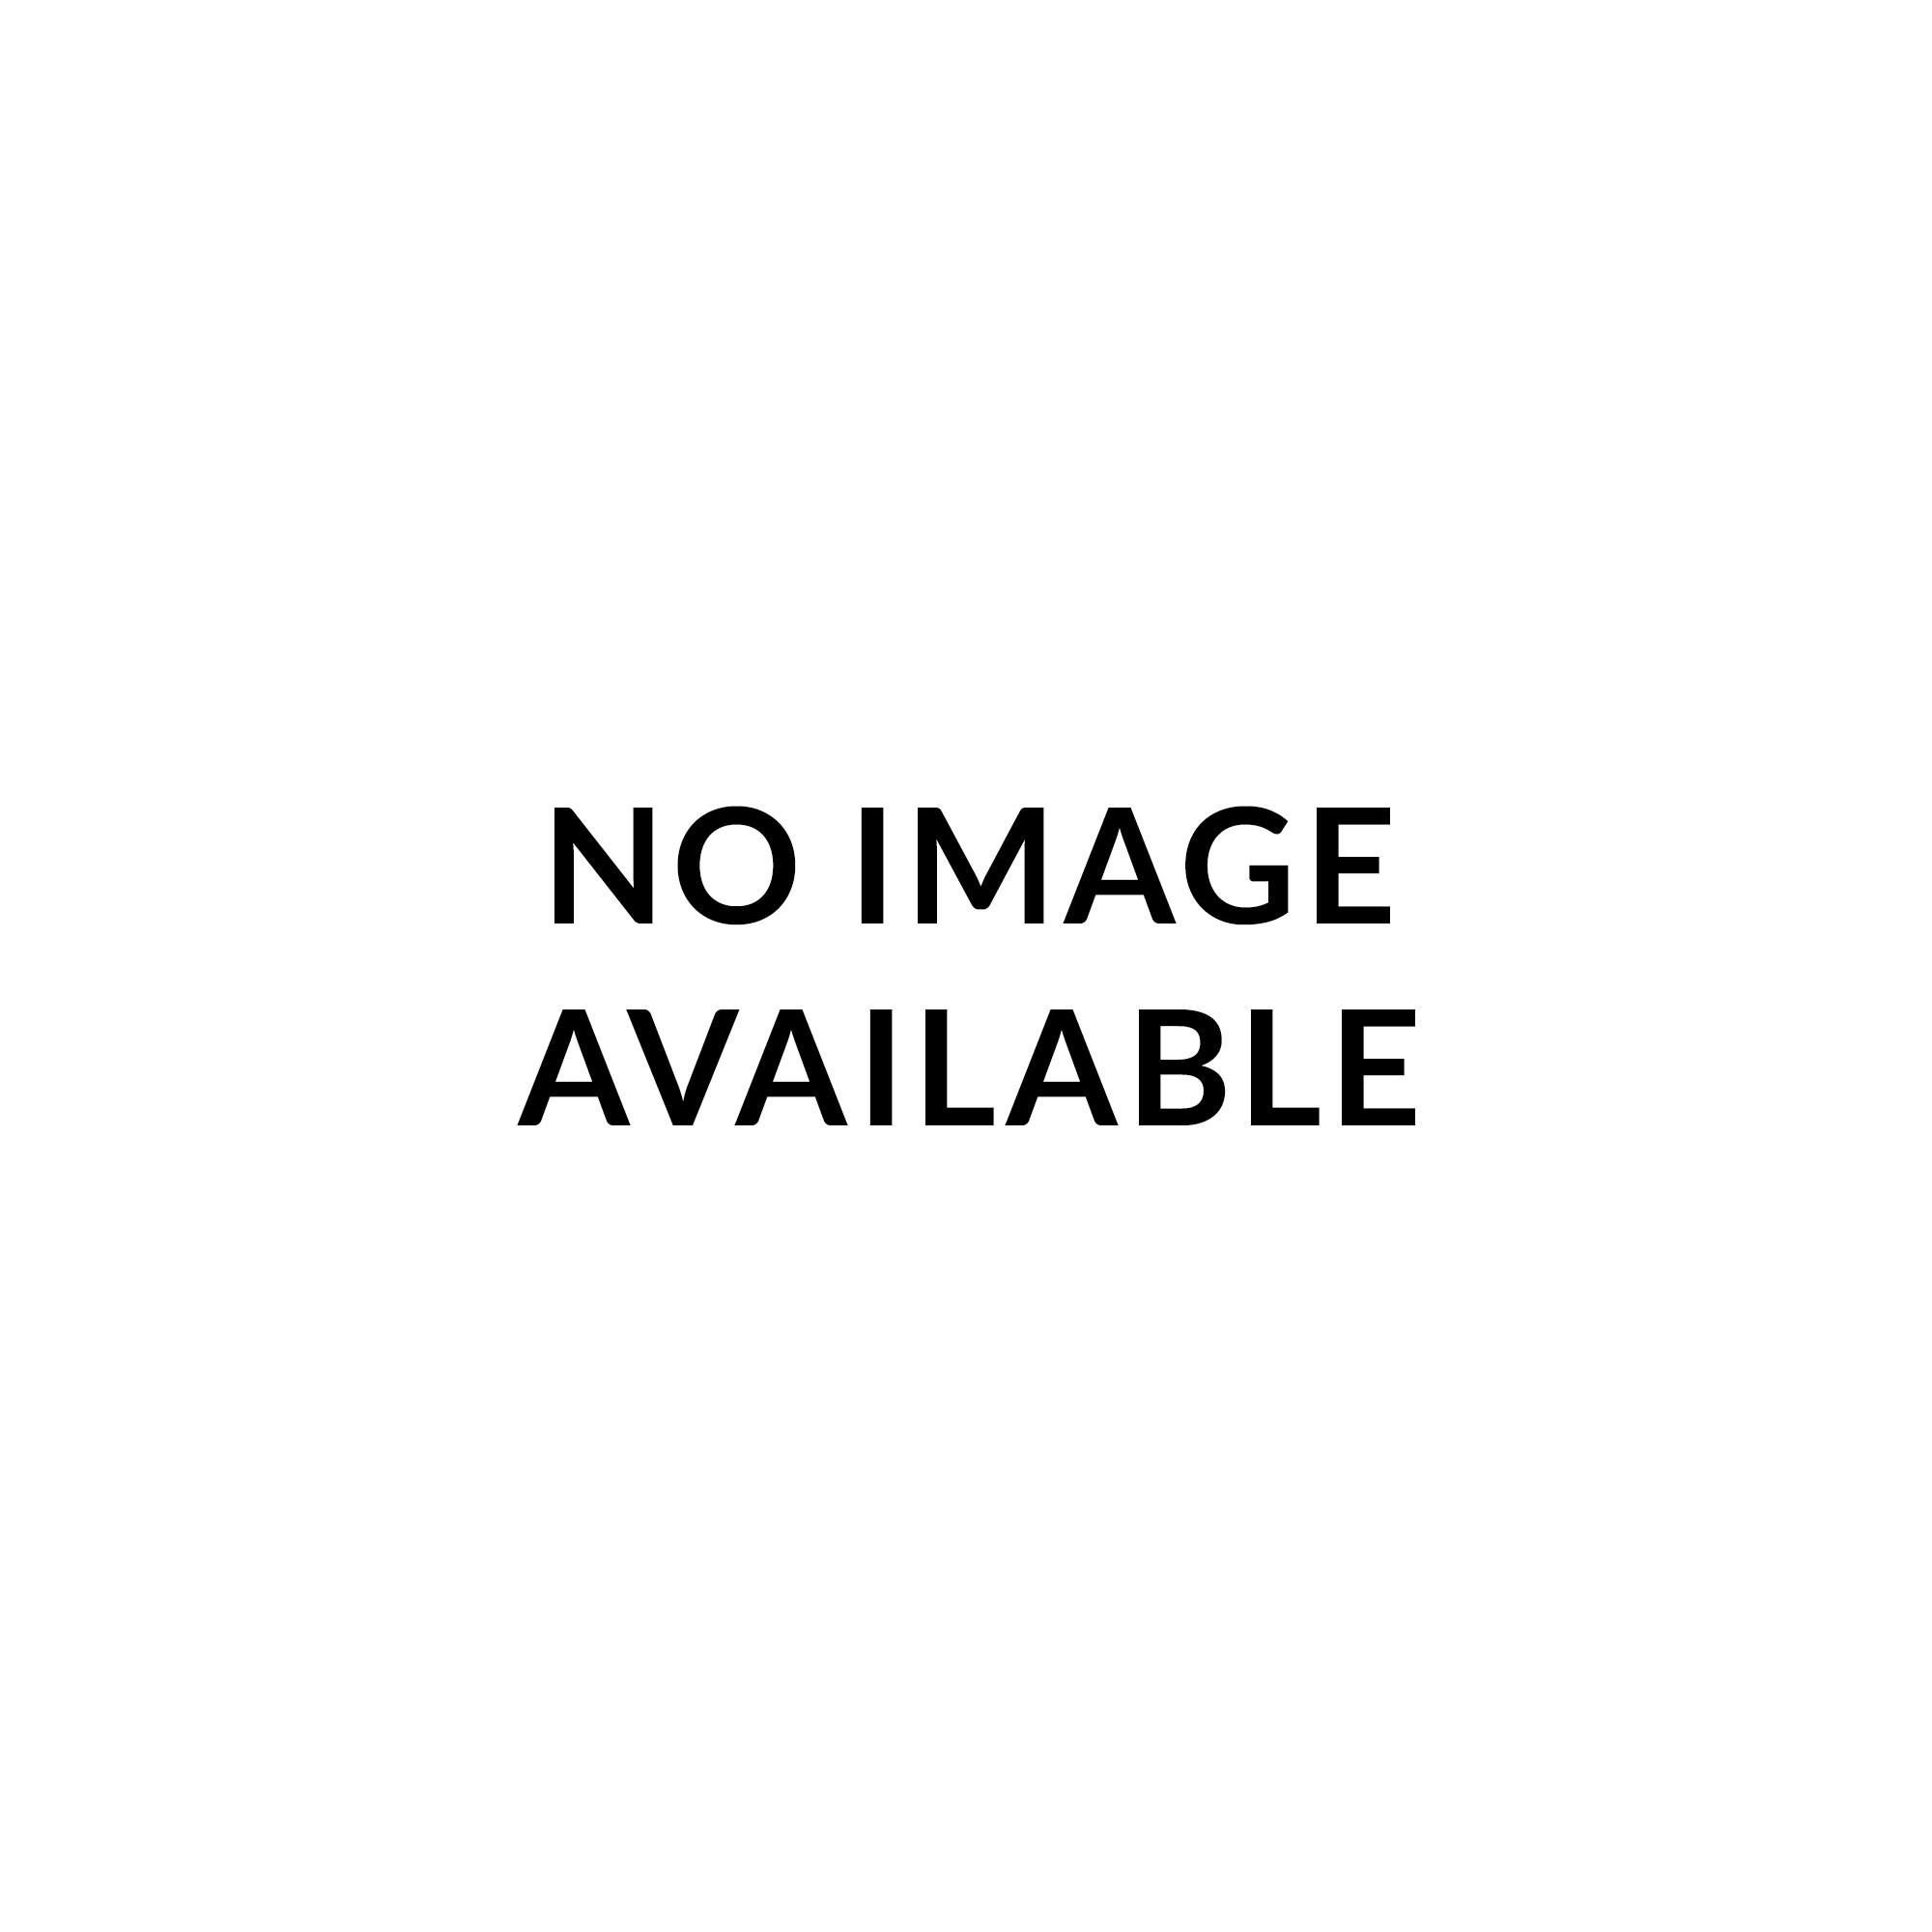 D'Addario PB070 Phosphor Bronze Acoustic Guitar Single String .070 Gauge